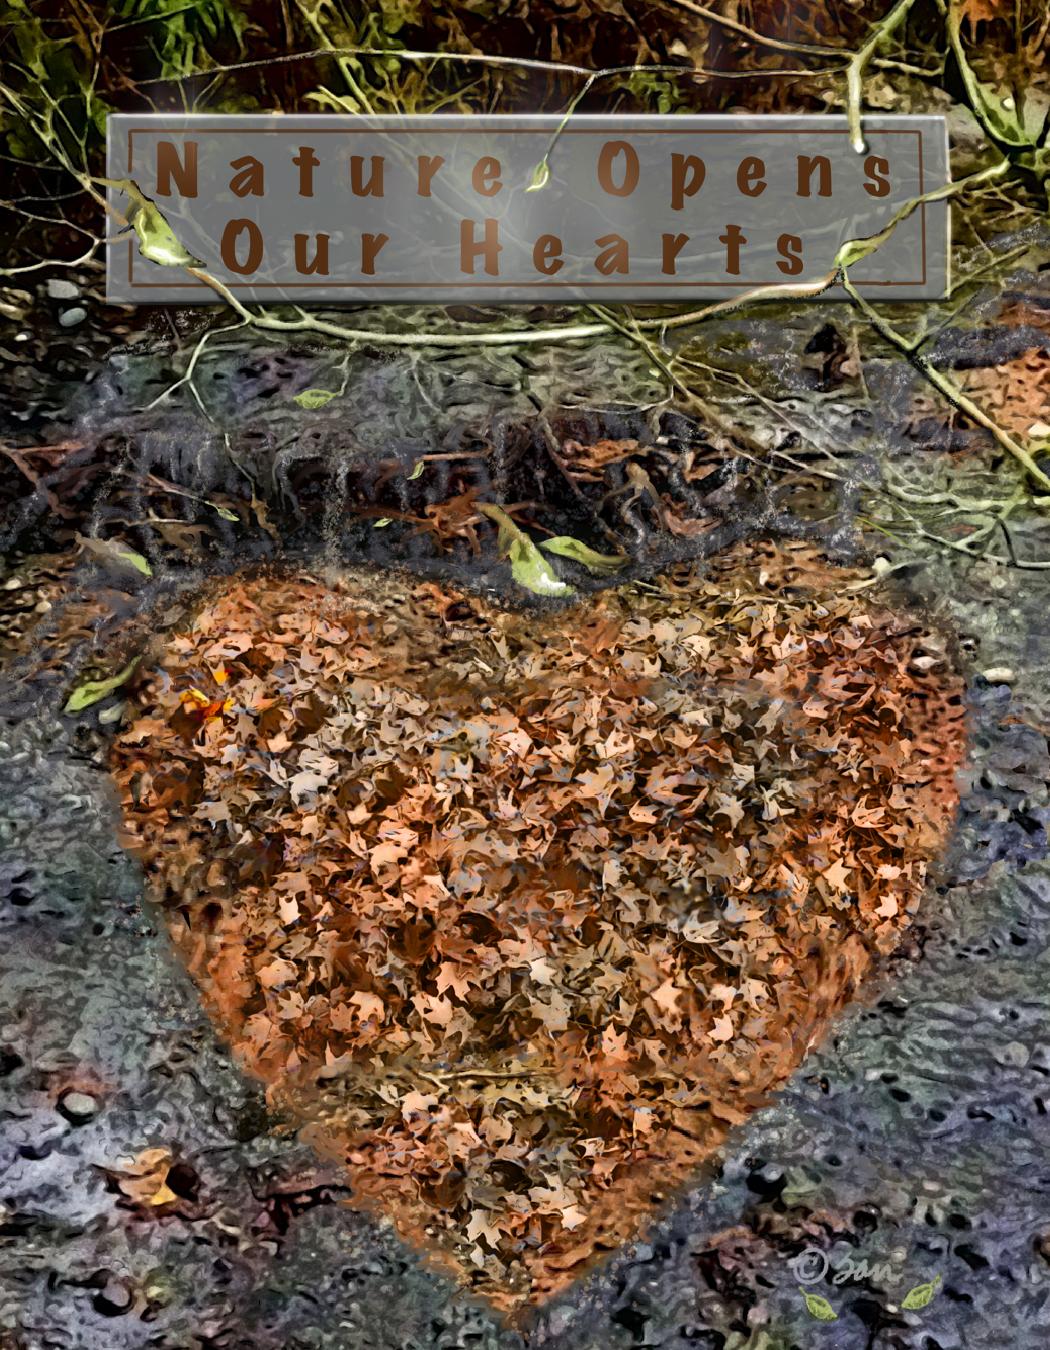 Digitally enhanced nature photo